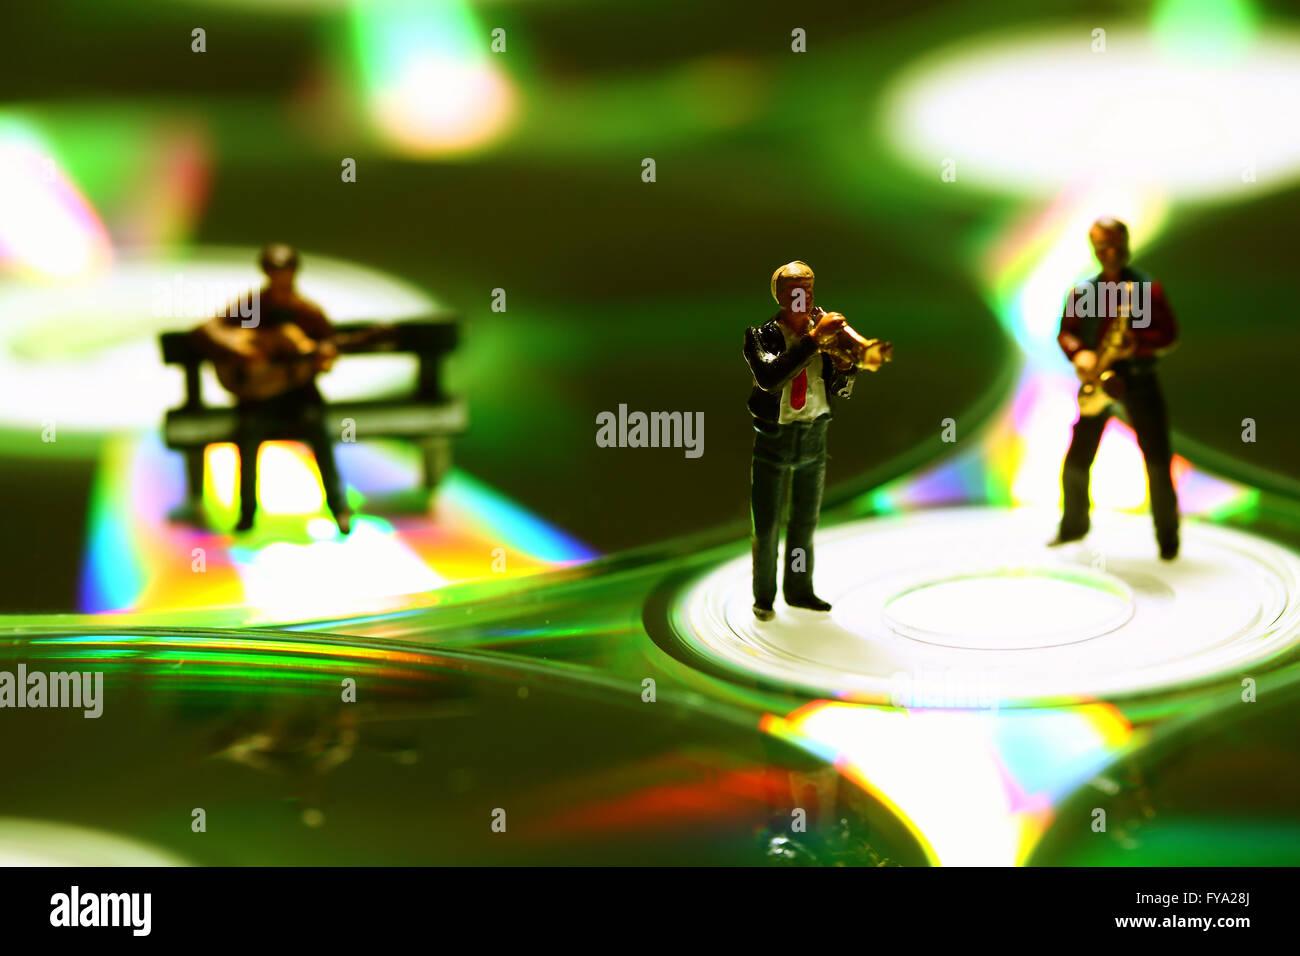 Miniature musicians compact disc - Stock Image